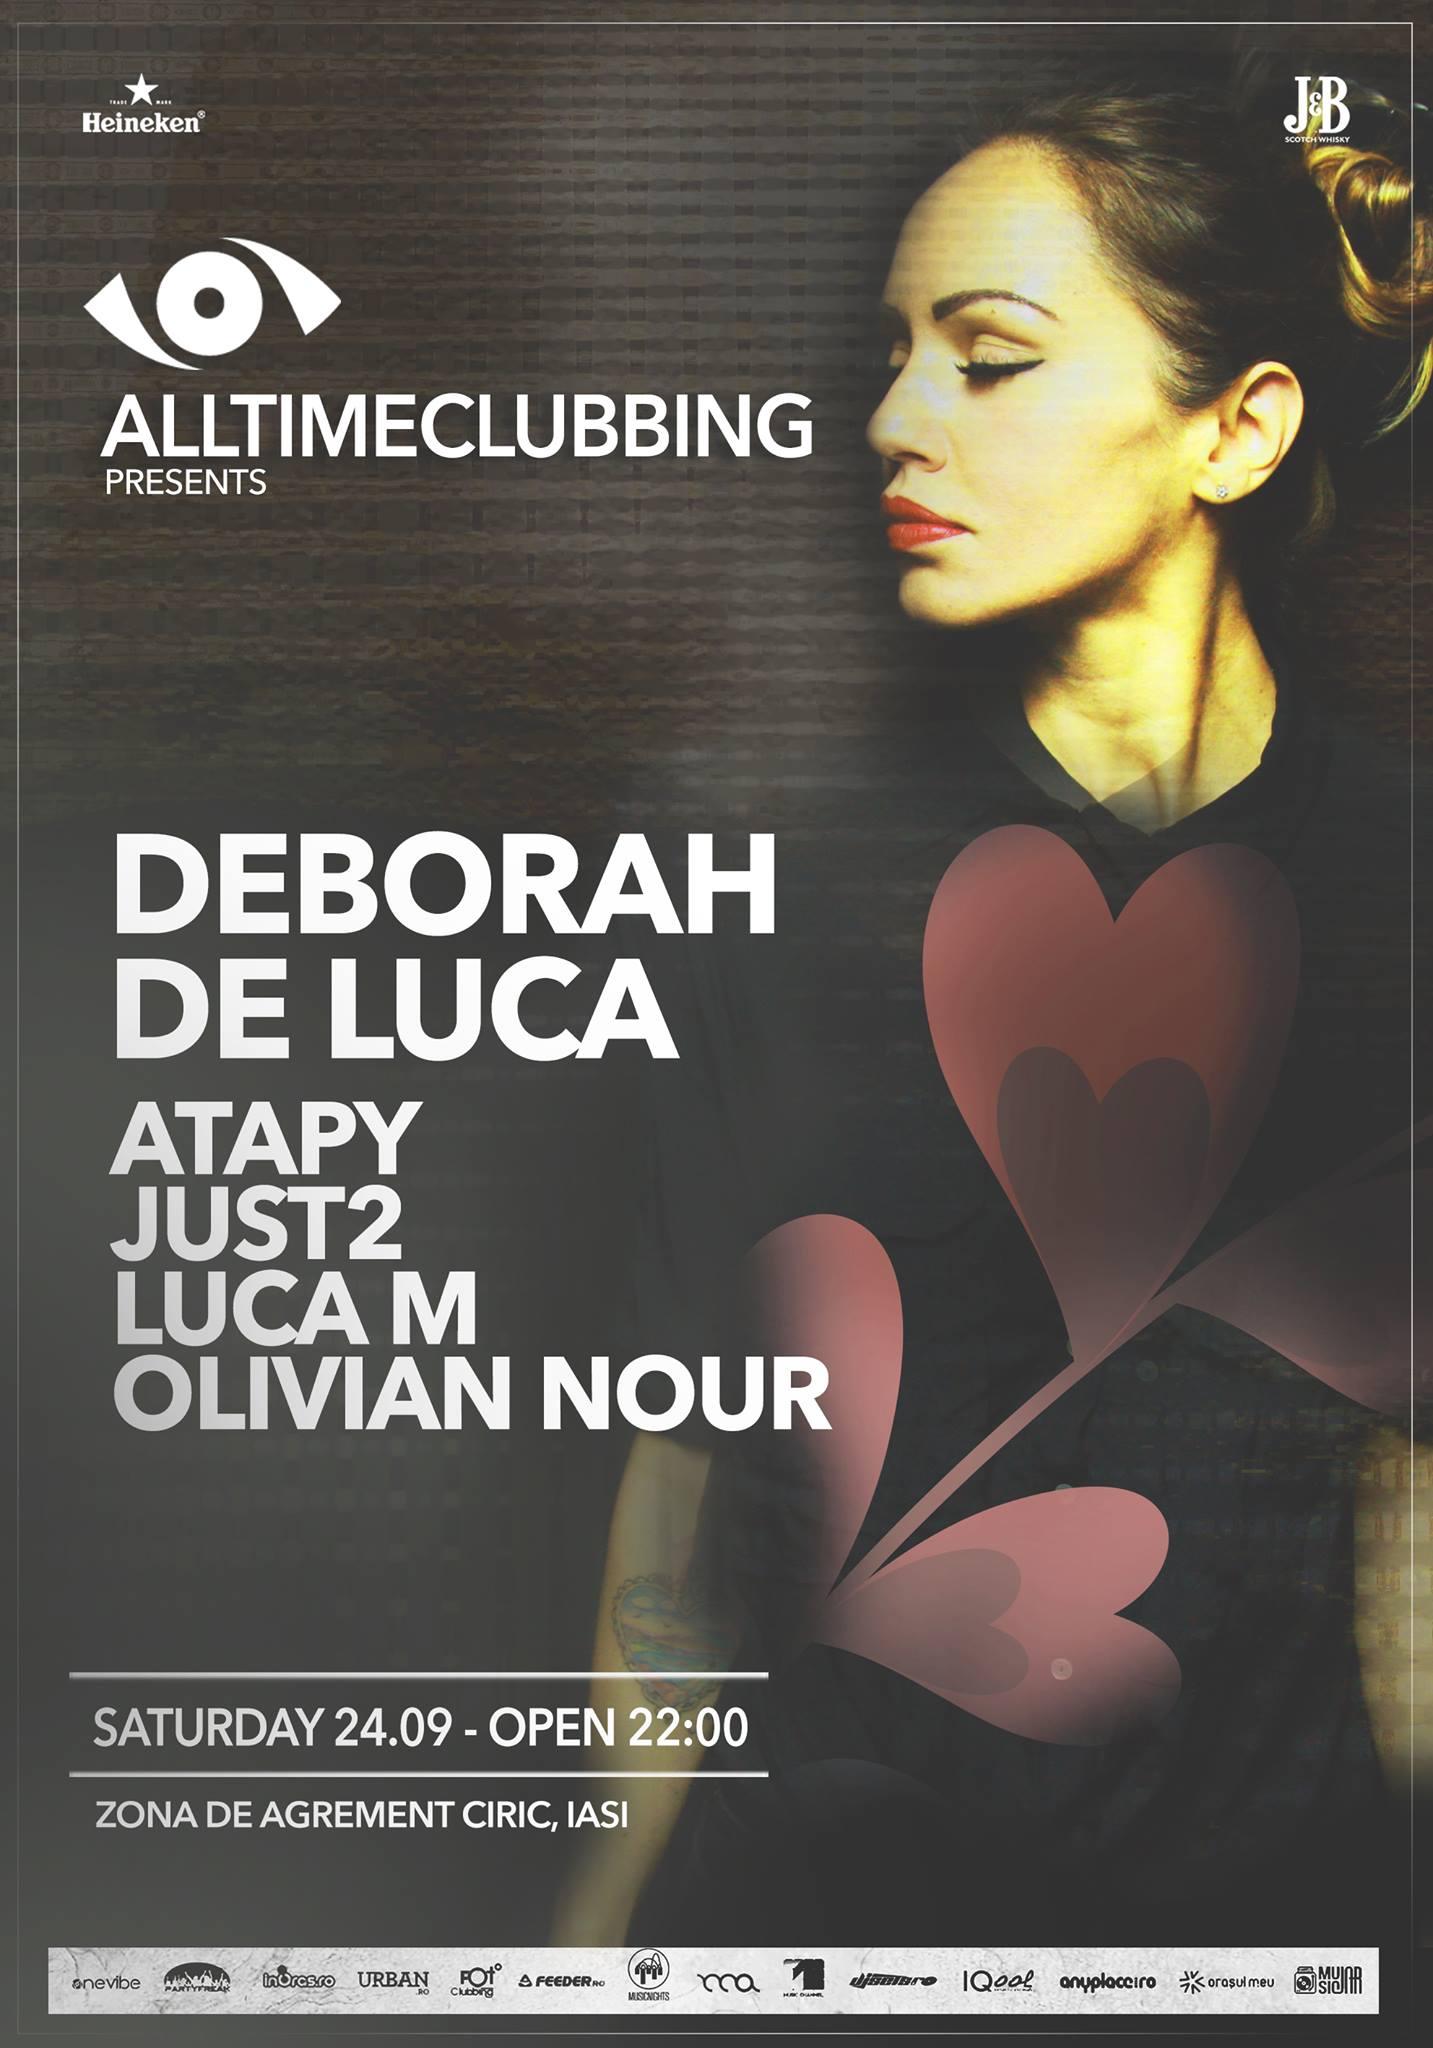 Alltimeclubbing pres. Deborah de Luca, Atapy, Luca M, JUST2, Olivian Nour @ Ciric Iași